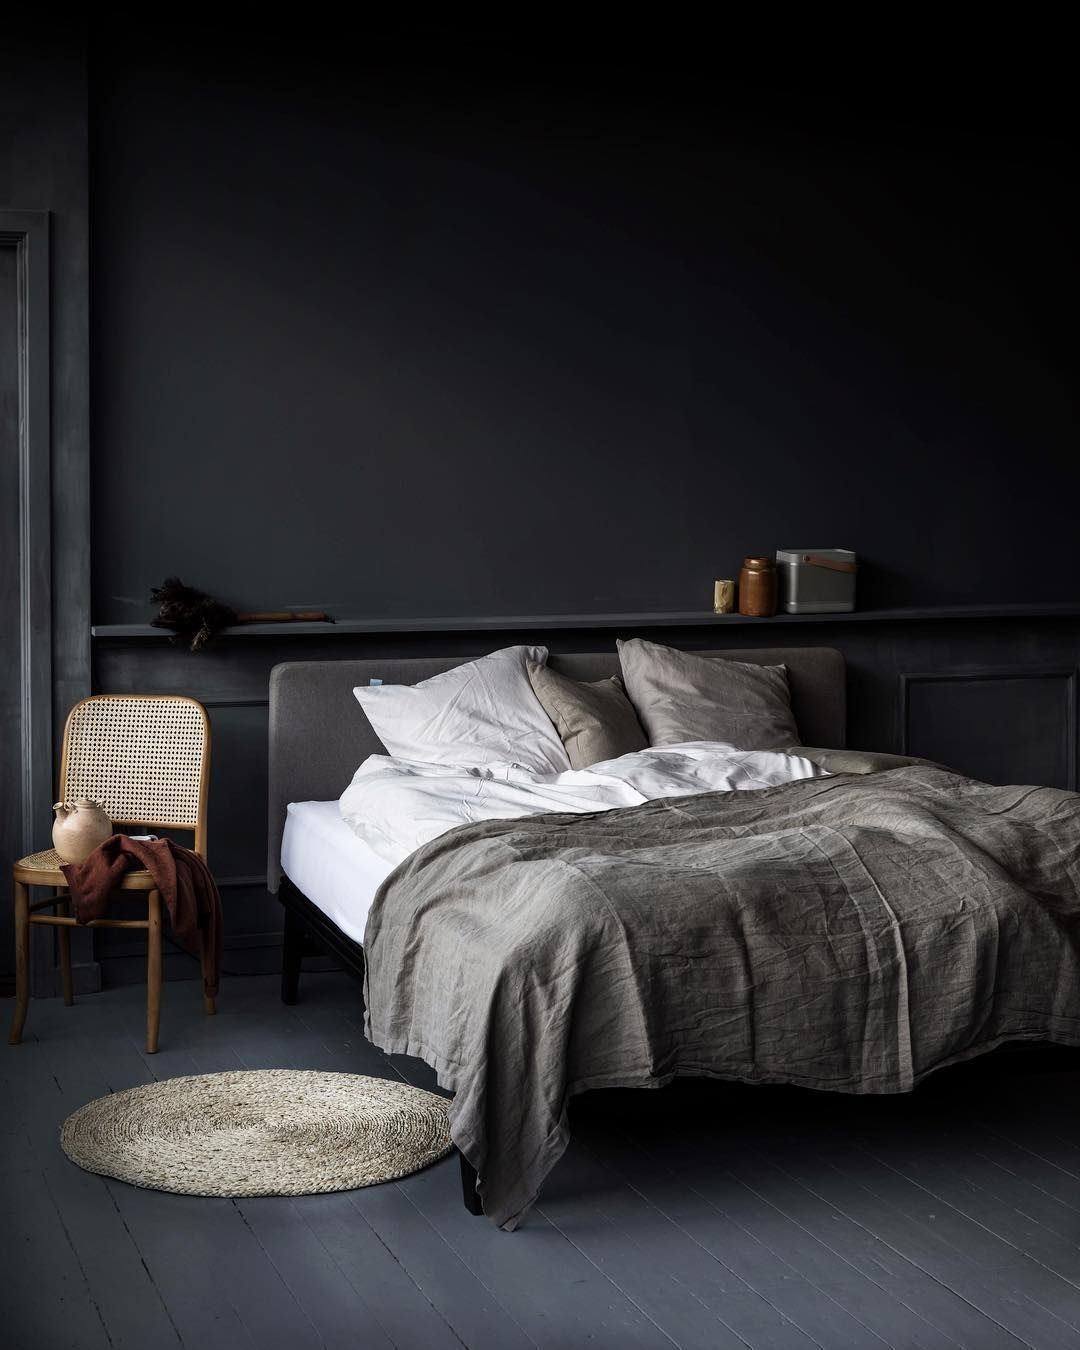 45 Dark And Moody Bedroom Decorating Ideas Homimu Com Moody Bedroom Modern Bedroom Interior Scandinavian Interior Bedroom